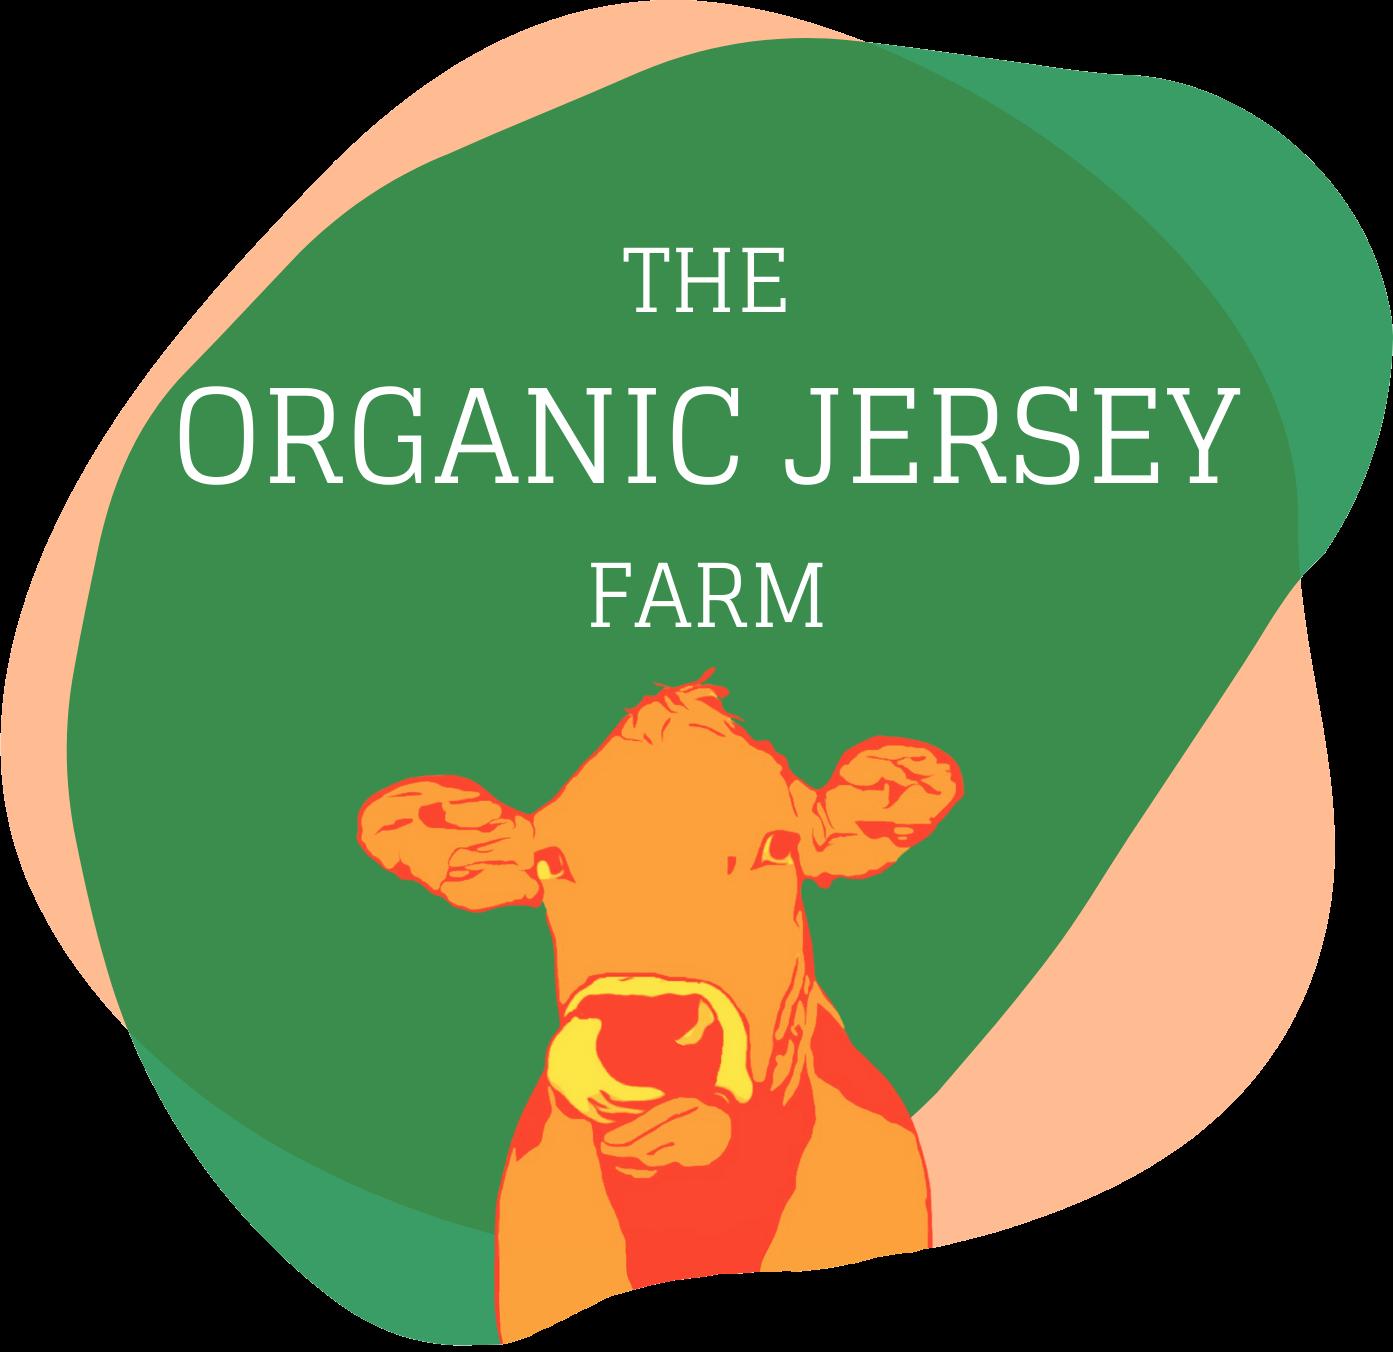 The Organic Jersey Farm logo